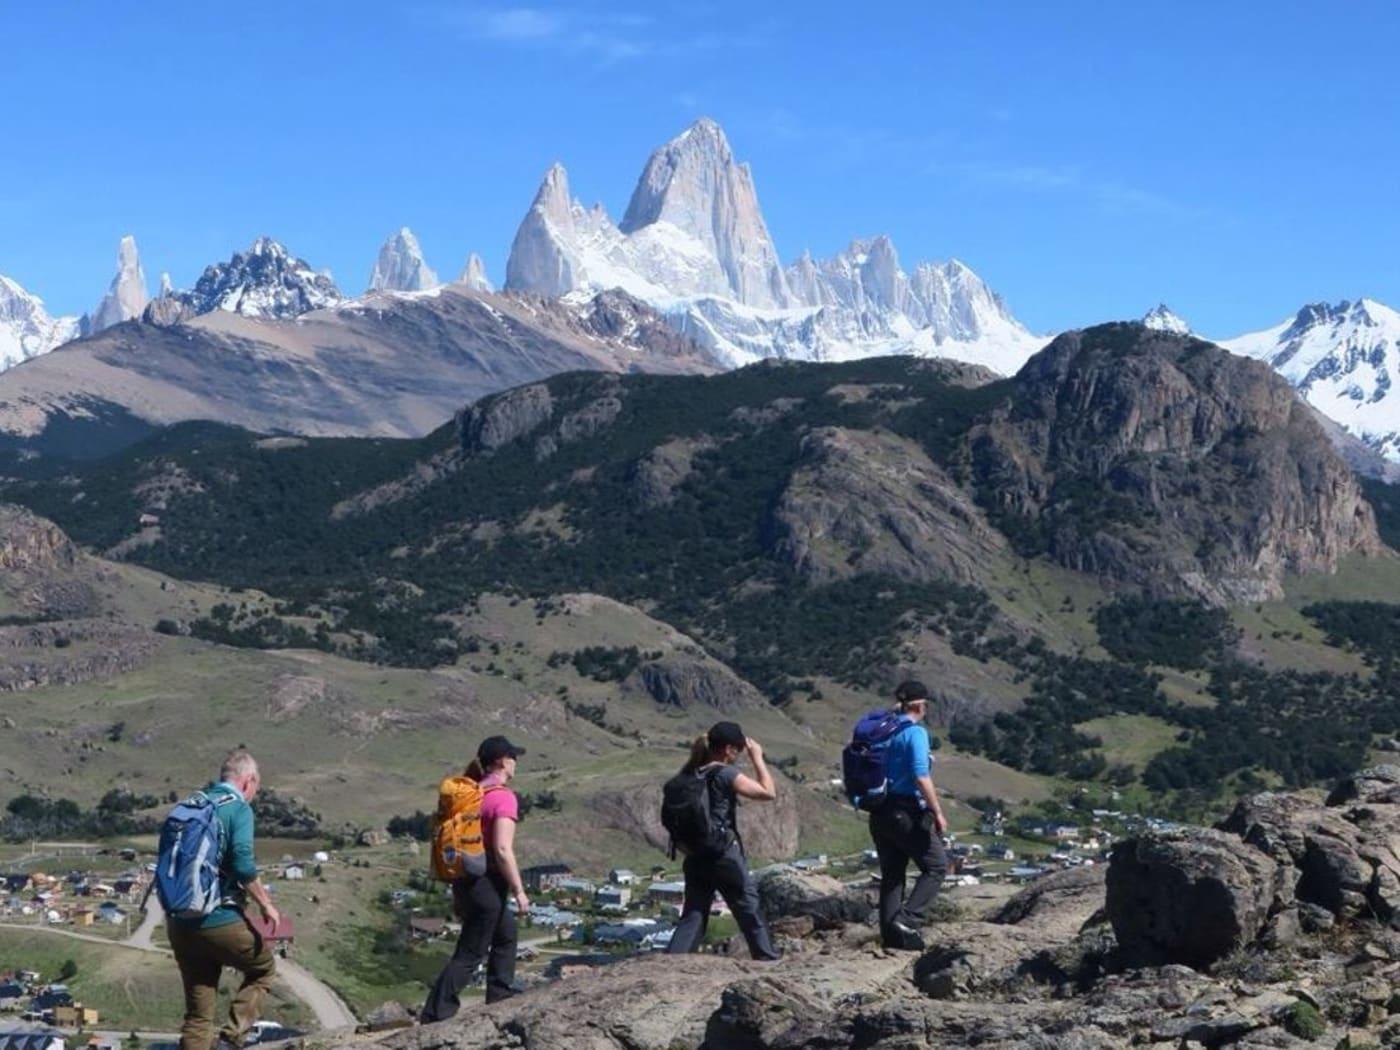 Spectacular trekking around the Cerro Torre and Fitzroy ranges